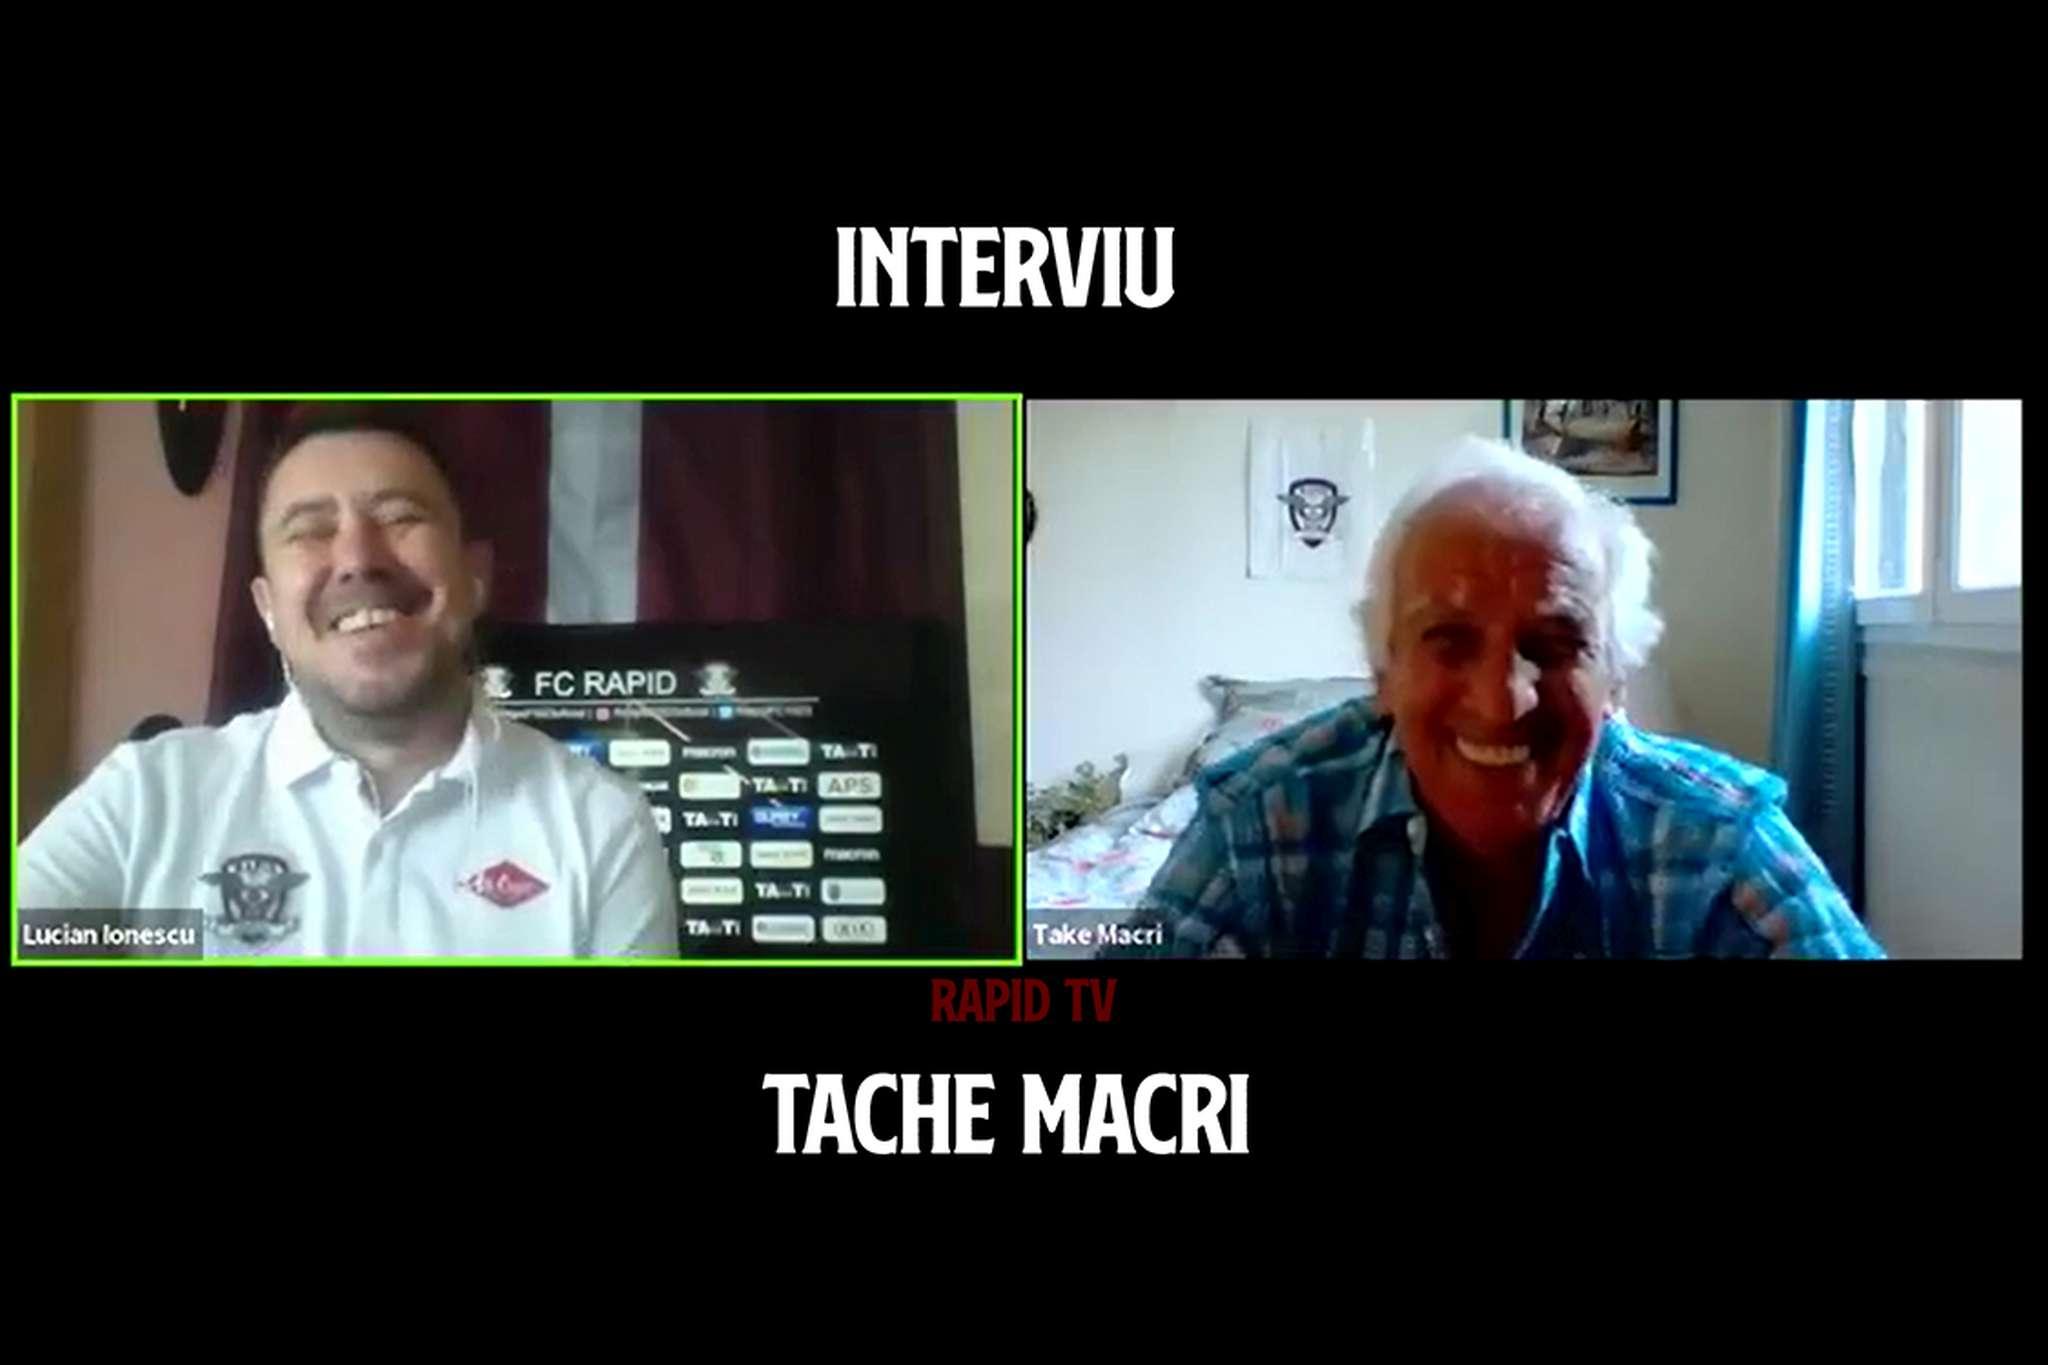 tache macri interviu fc rapid